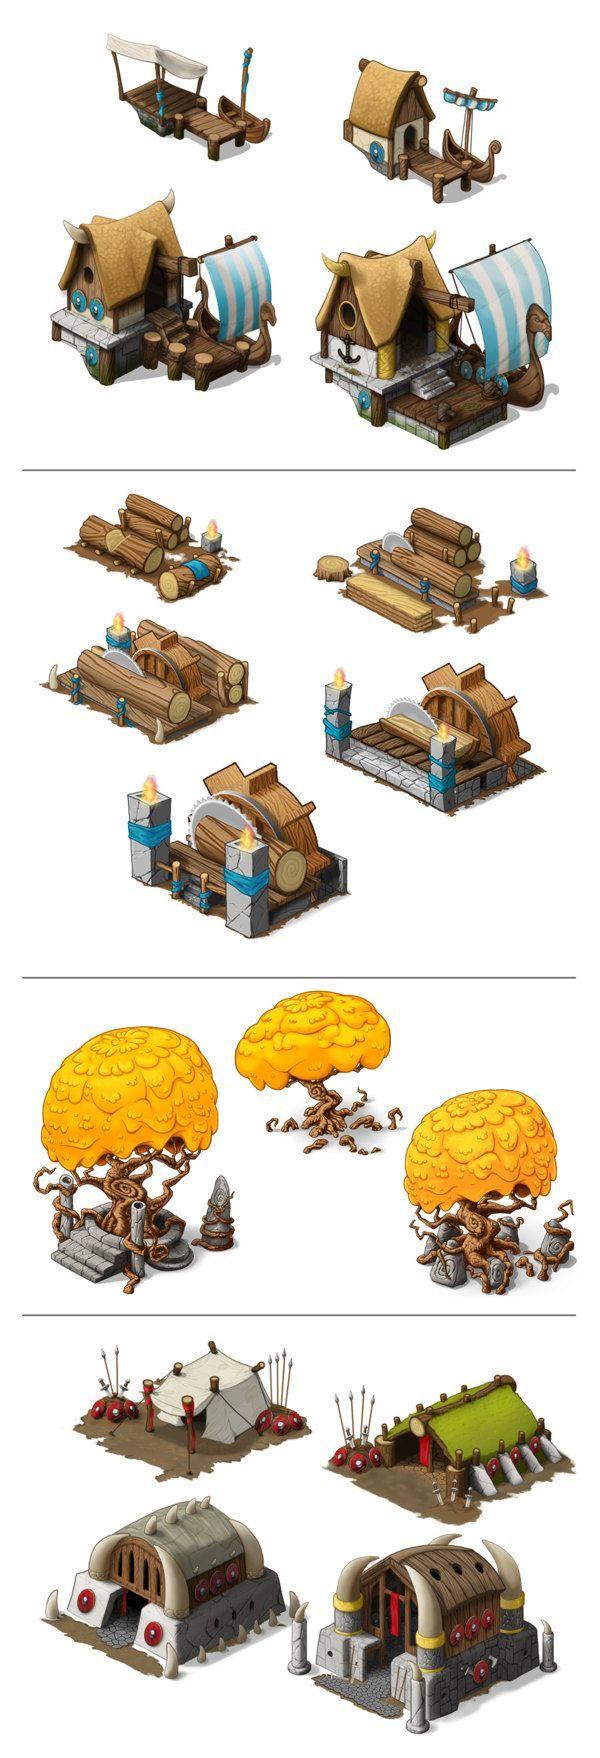 Godsrule - Building Levels by Thorir Celin, via Behance ★ Find more at http://www.pinterest.com/competing/